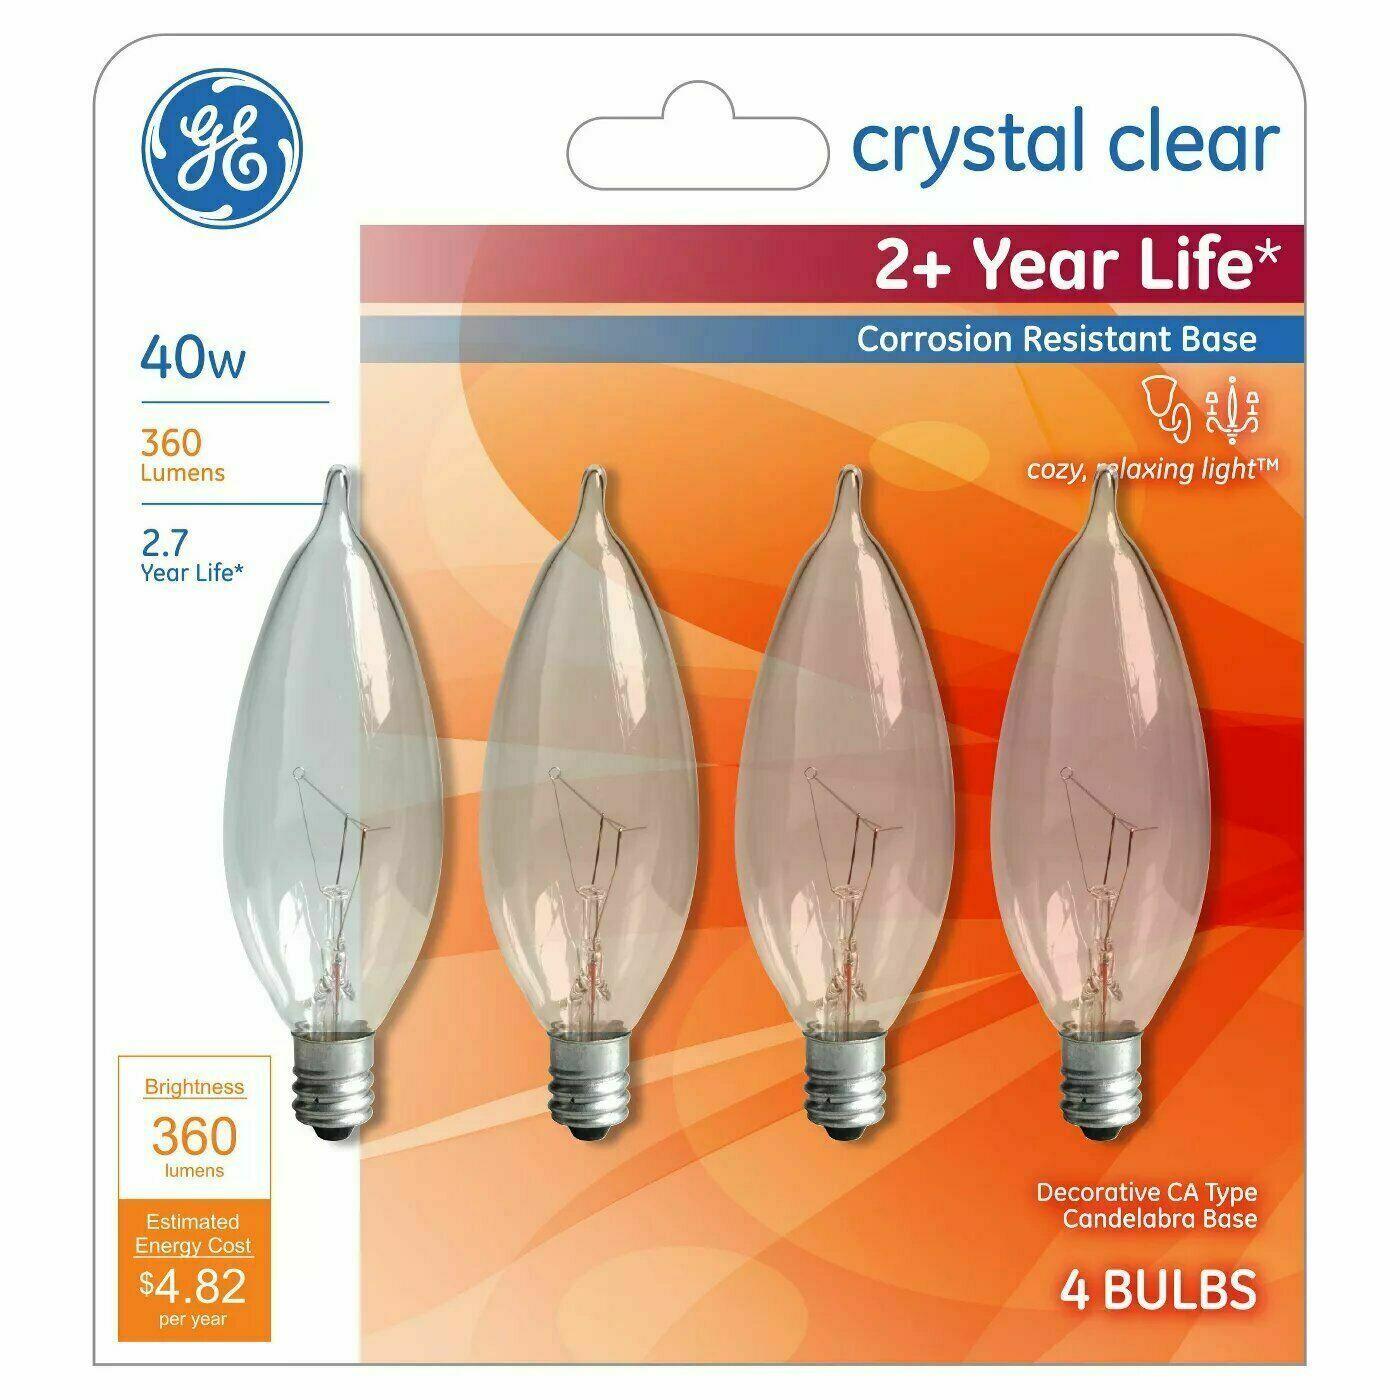 4 GE Lighting 40cac/l/bb Cd4 Ge Lighting 40w, Ca10 Incandescent Bulbs